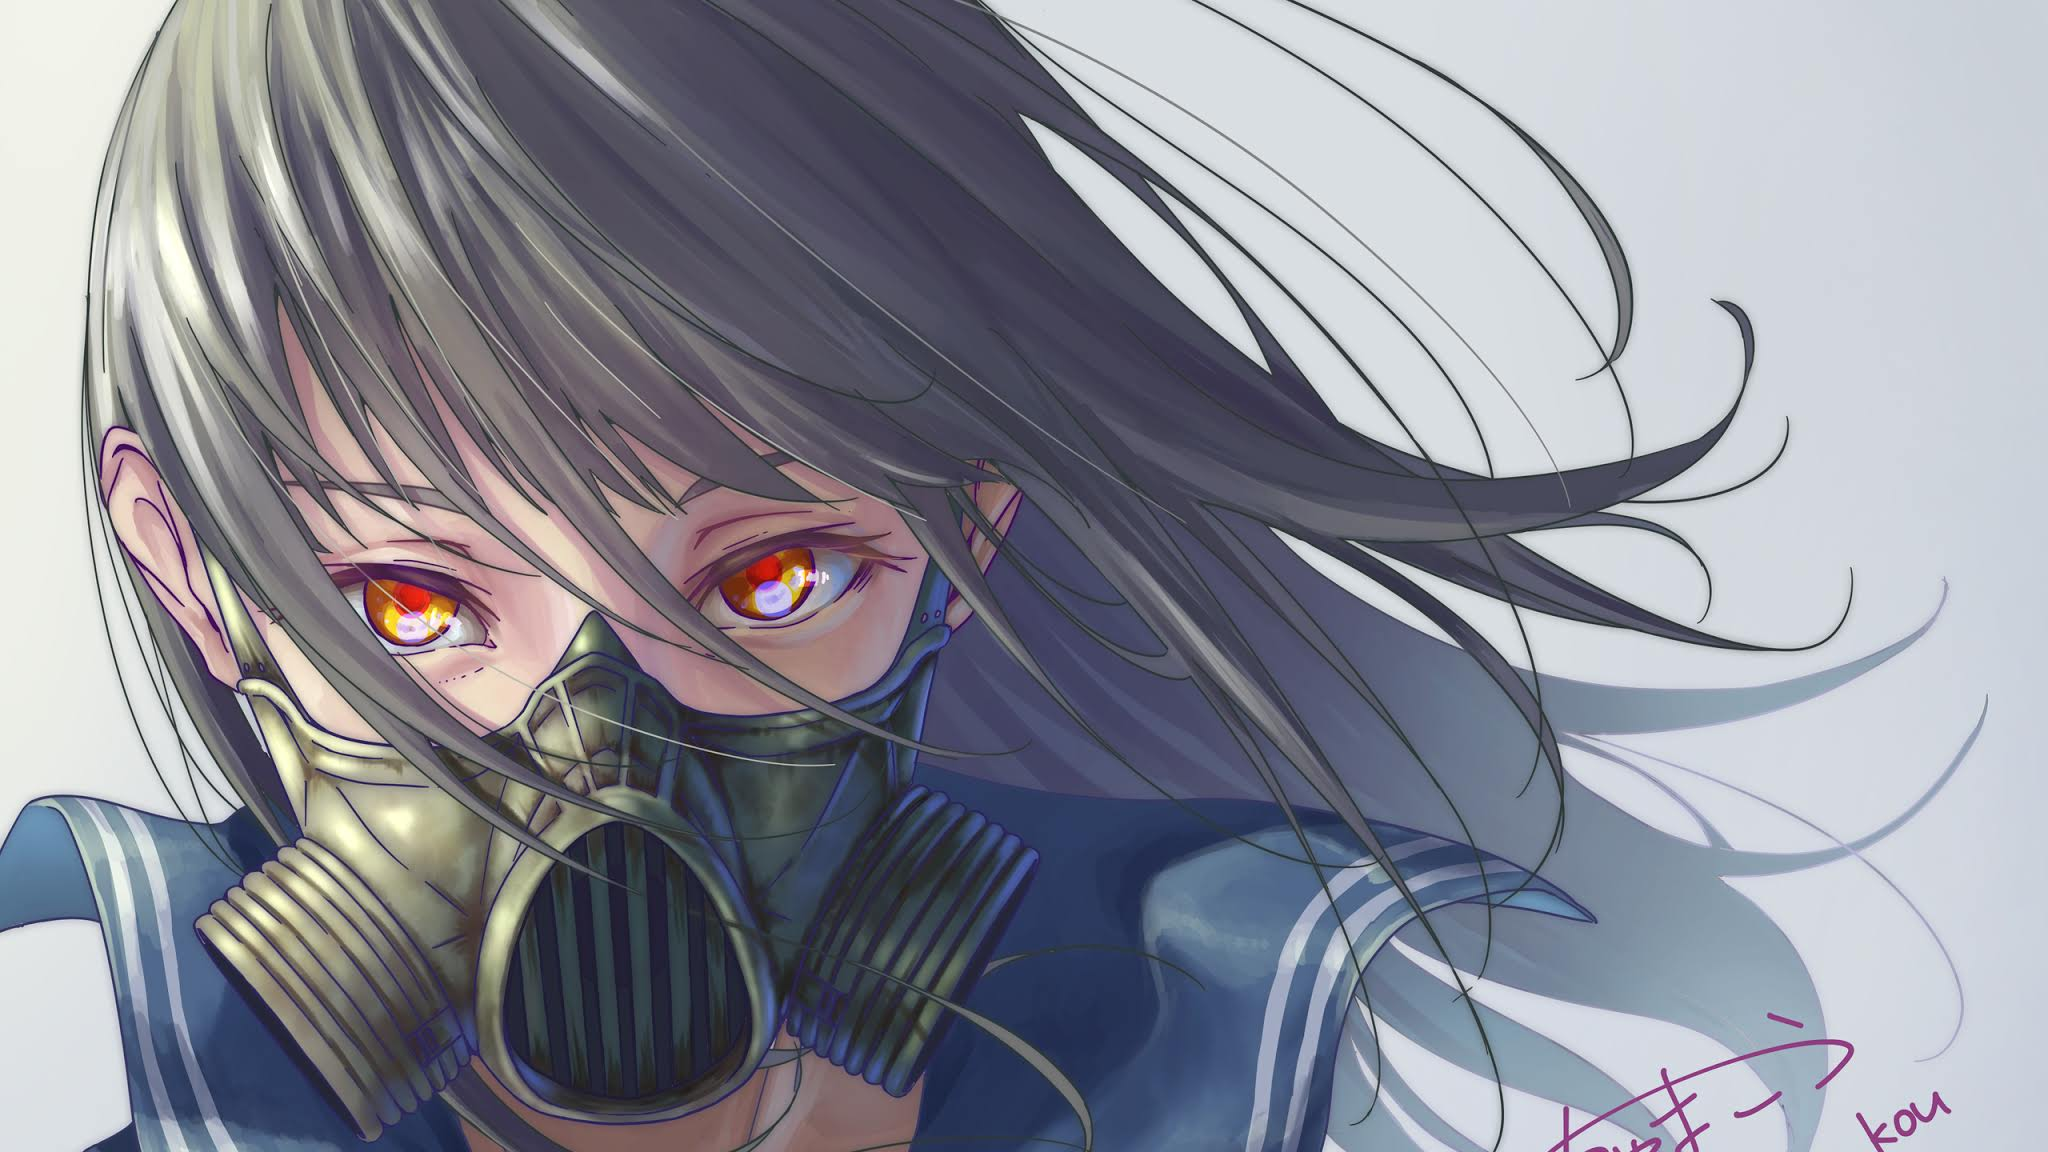 Mask Anime Girl Wallpapers - Top Free Mask Anime Girl Backgrounds